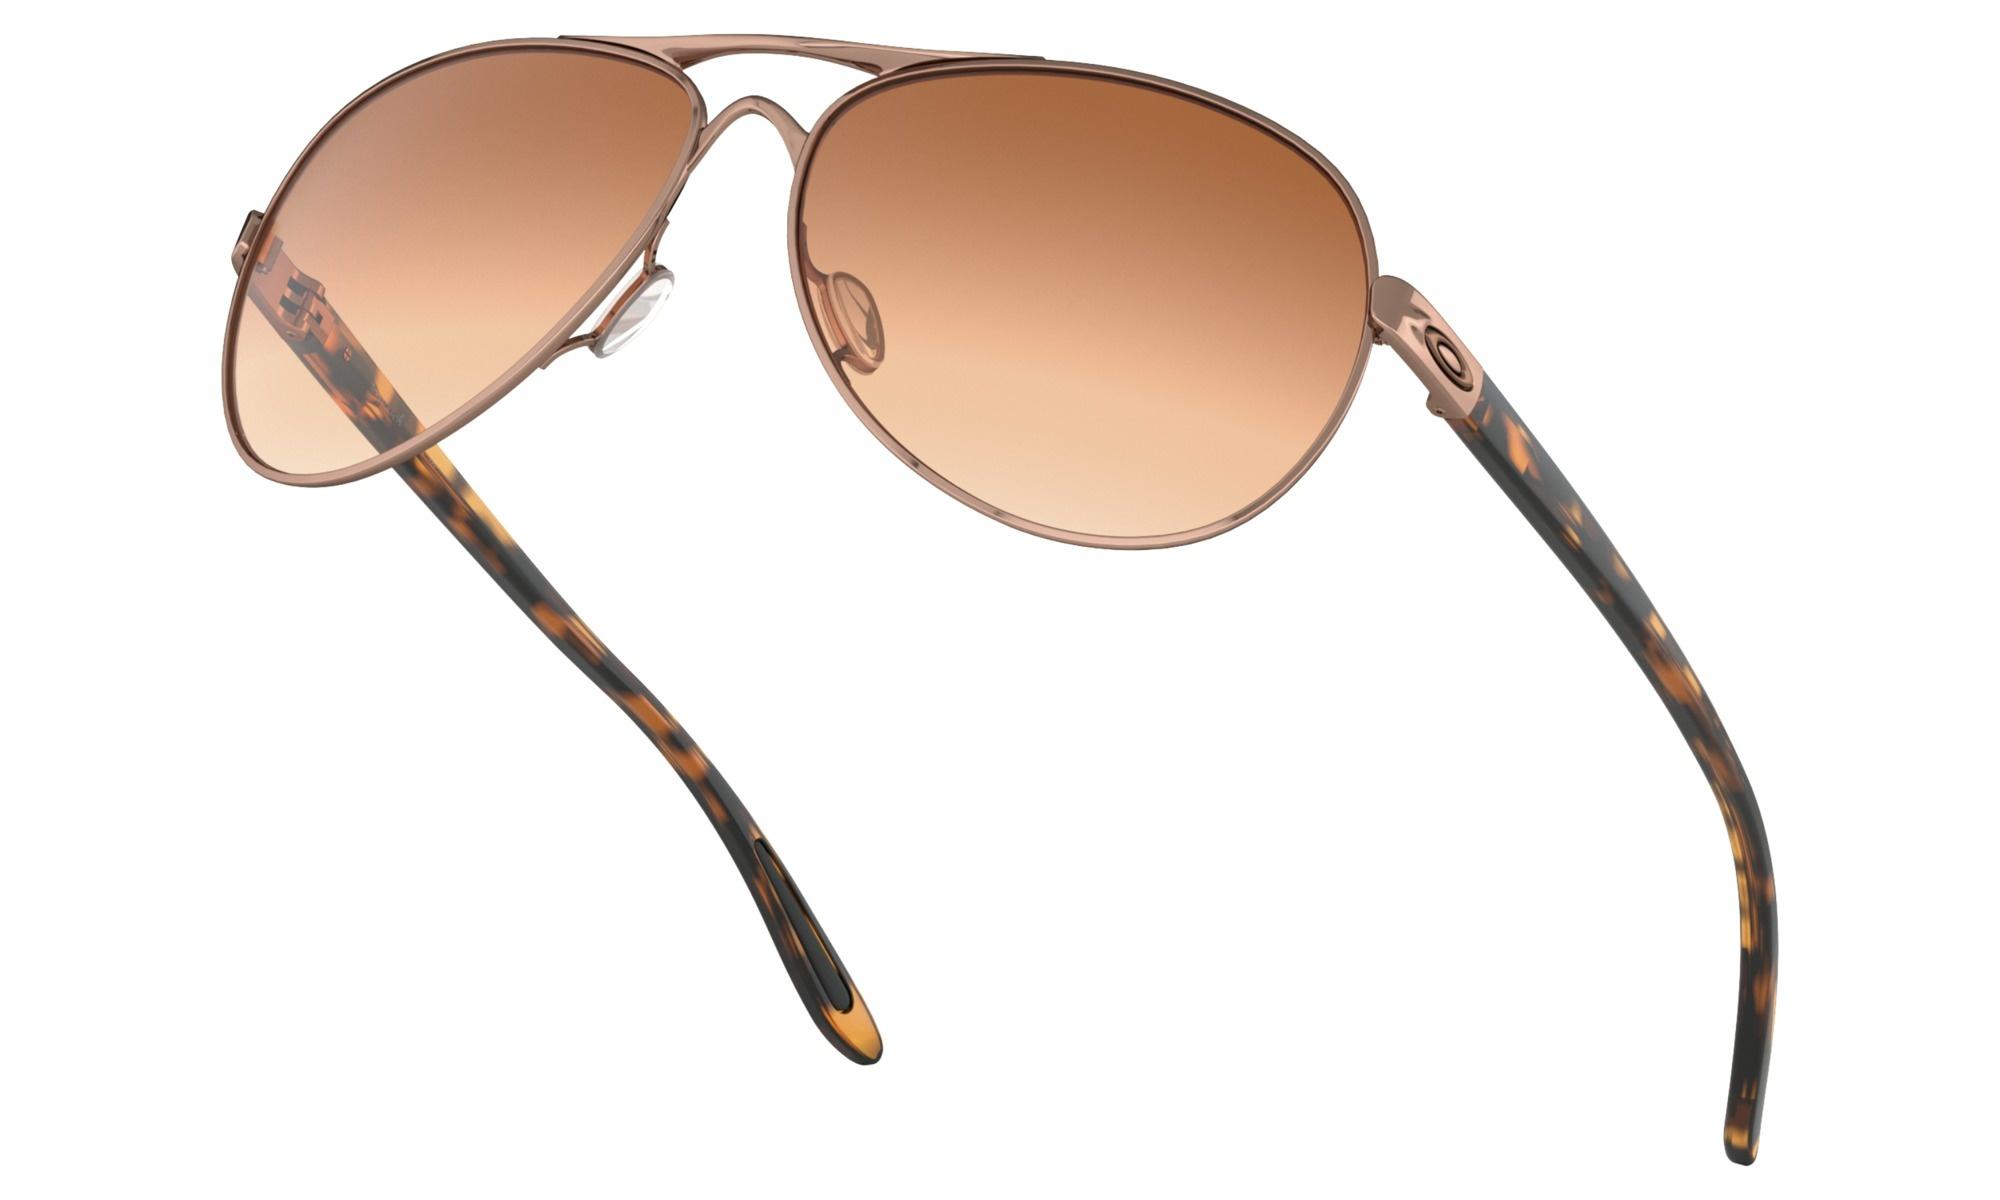 6c86b7569b Oakley Feedback Sunglasses - Rose Gold Vr50 Brown Gradient - MODA3